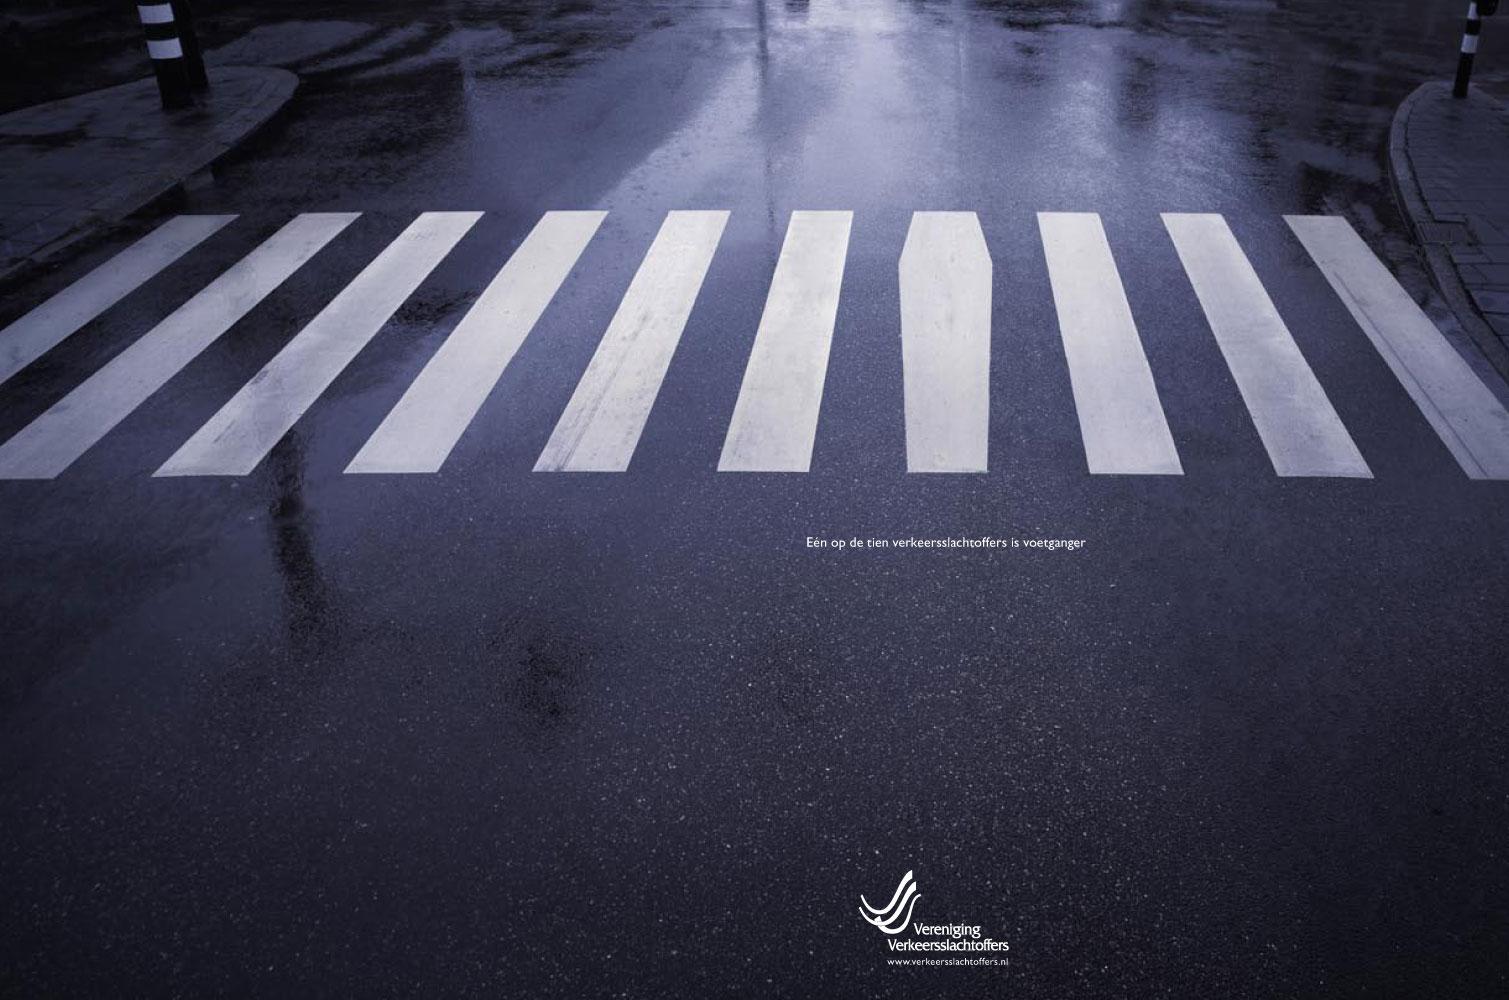 verkeersslachtoffers-3gr